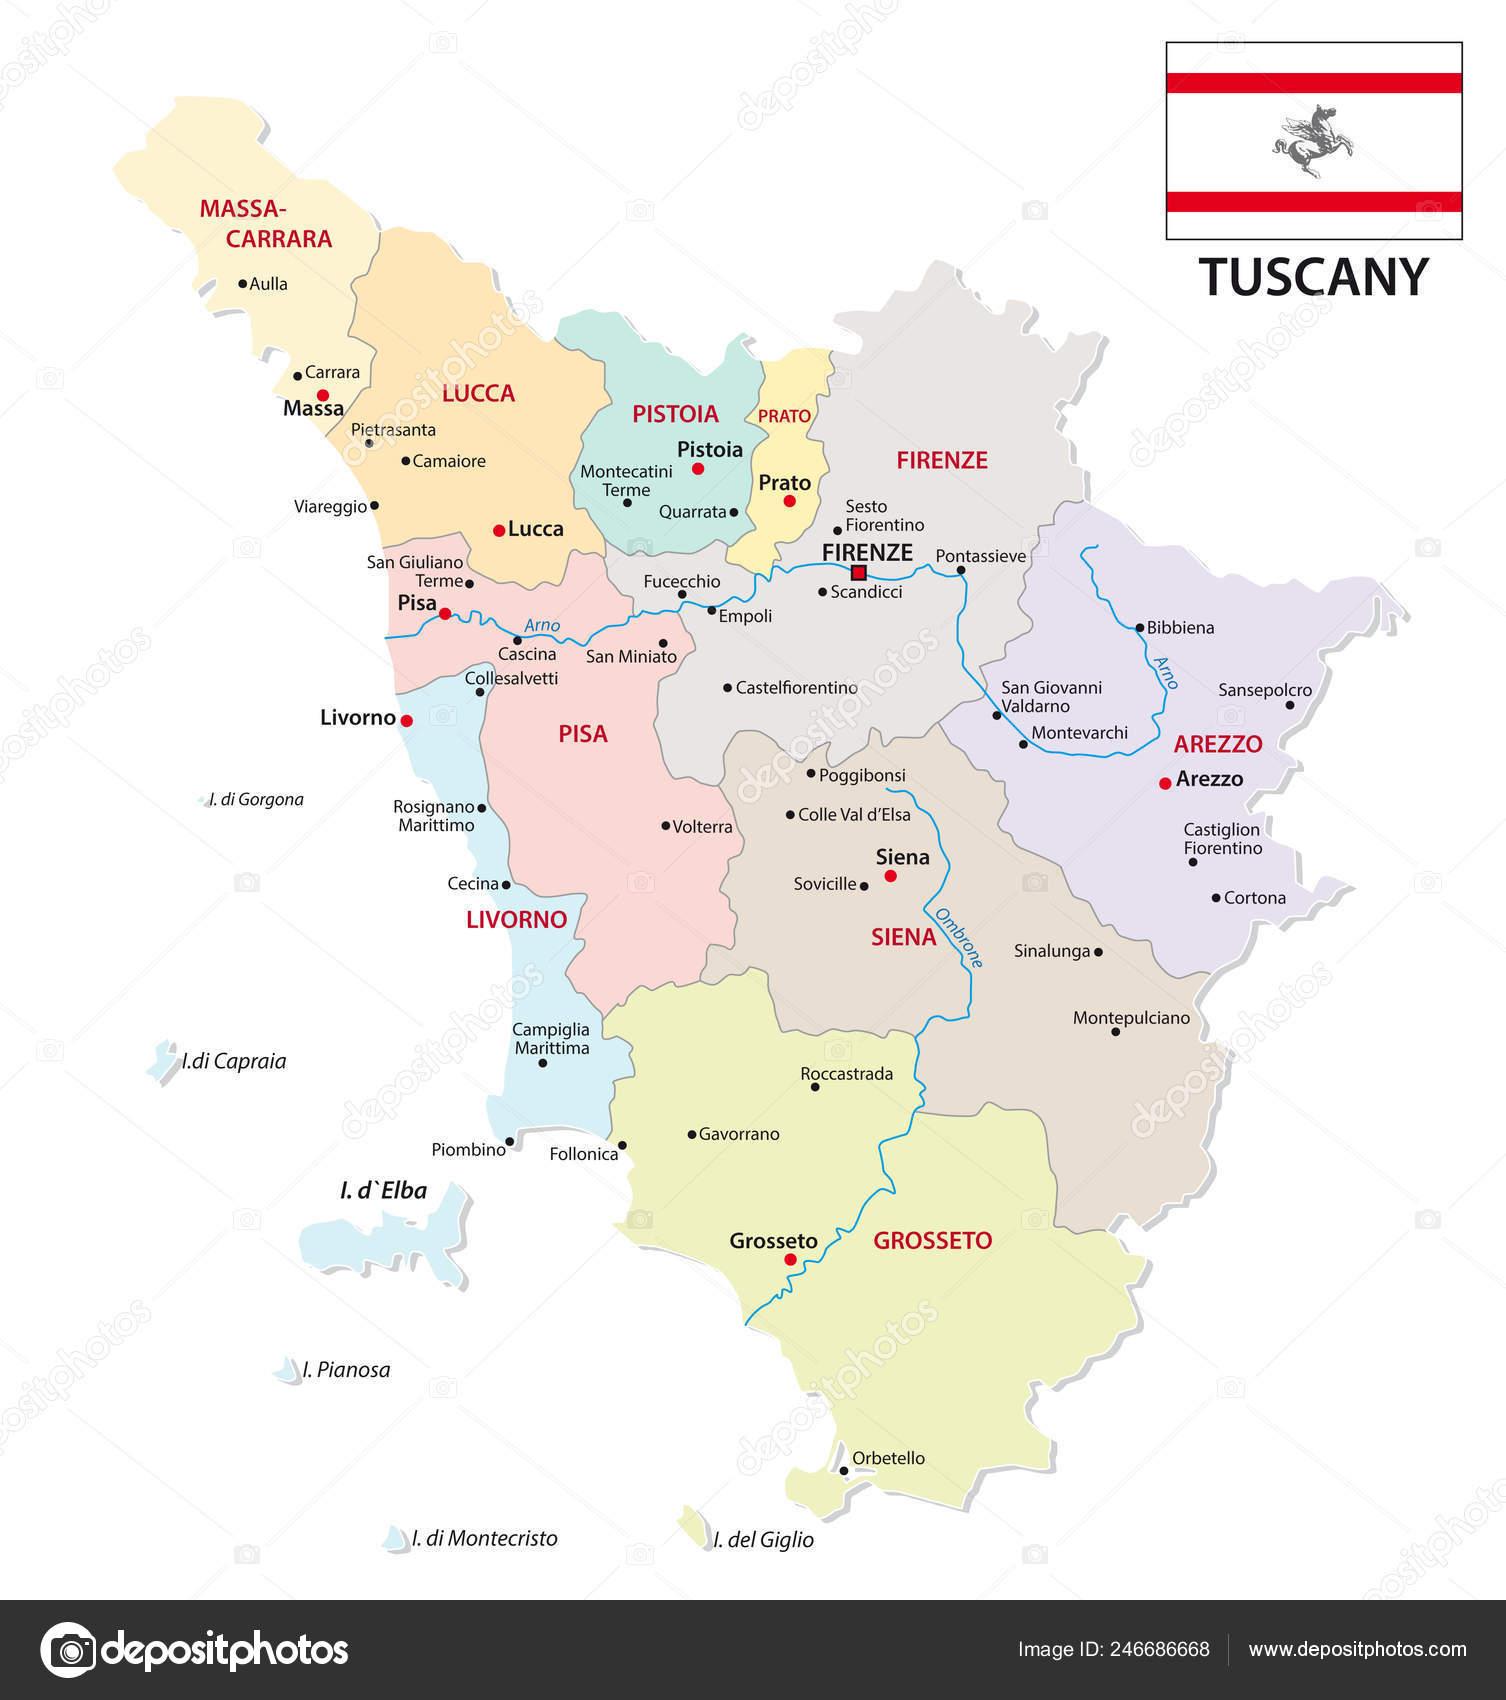 Toscana Politica Cartina Geografica.Mappa Amministrativa Politica Toscana Con Bandierina